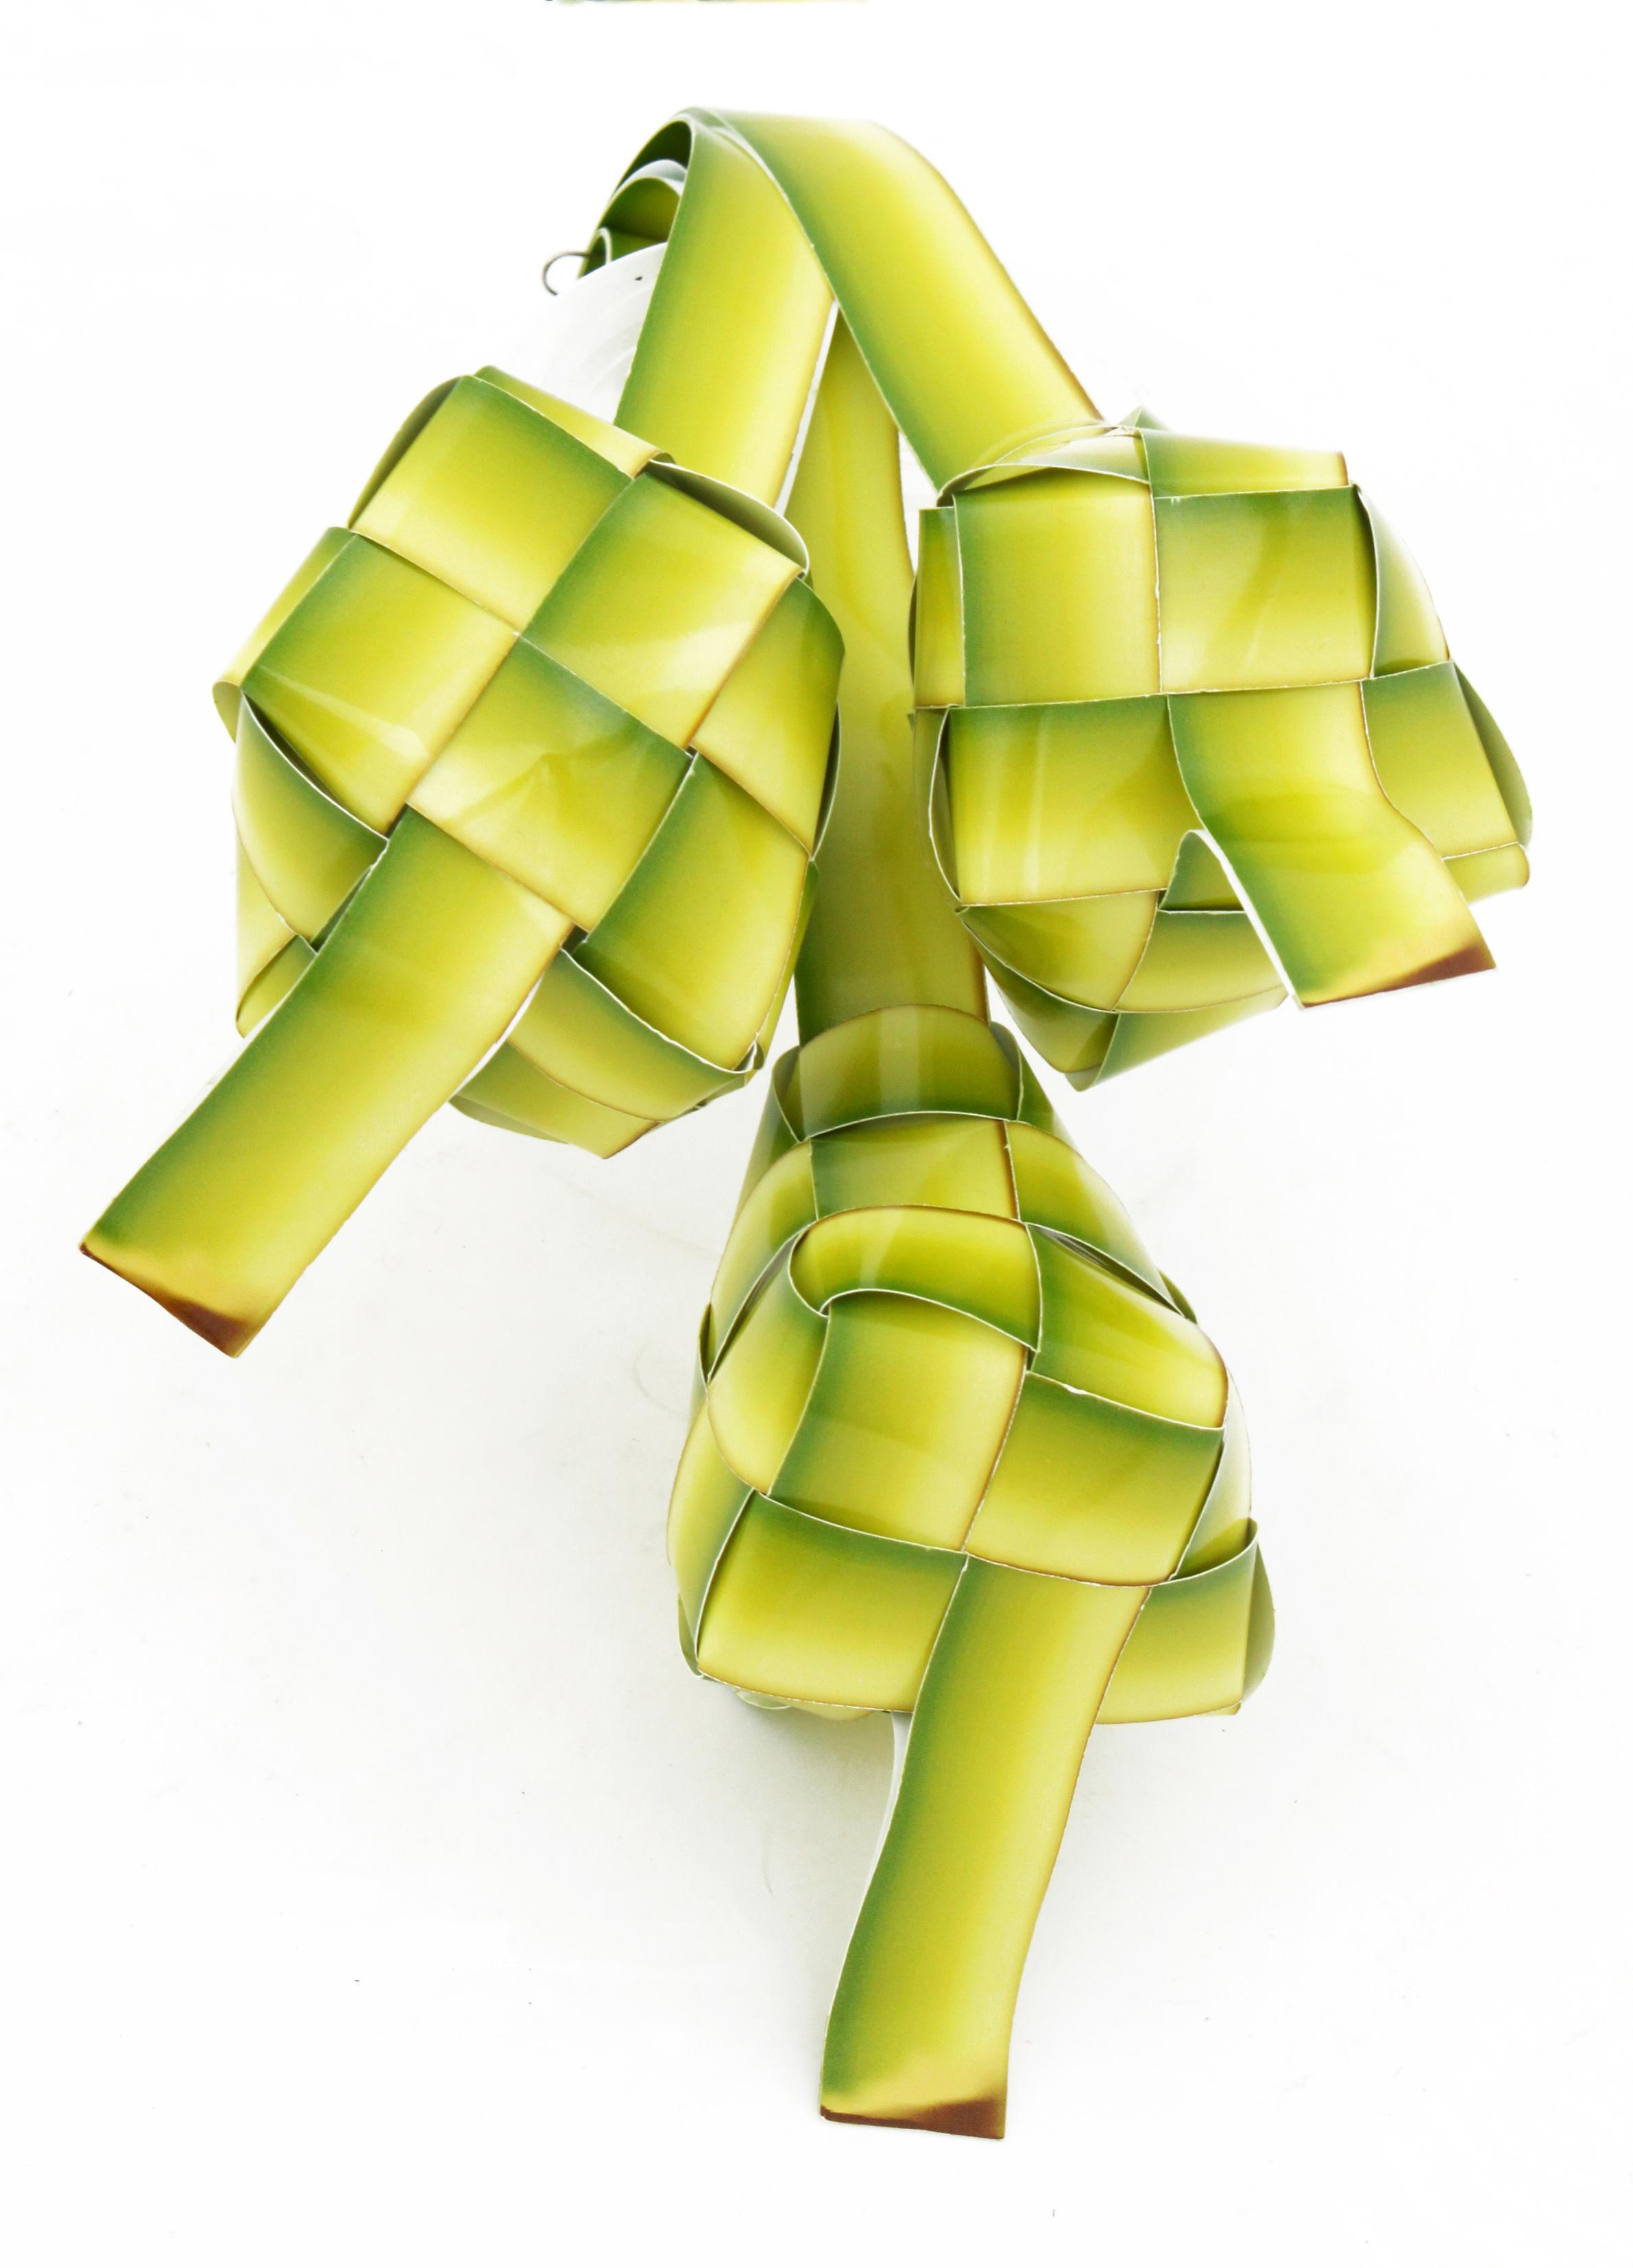 File:Drawing of three ketupat - 05.jpg - Wikimedia Commons